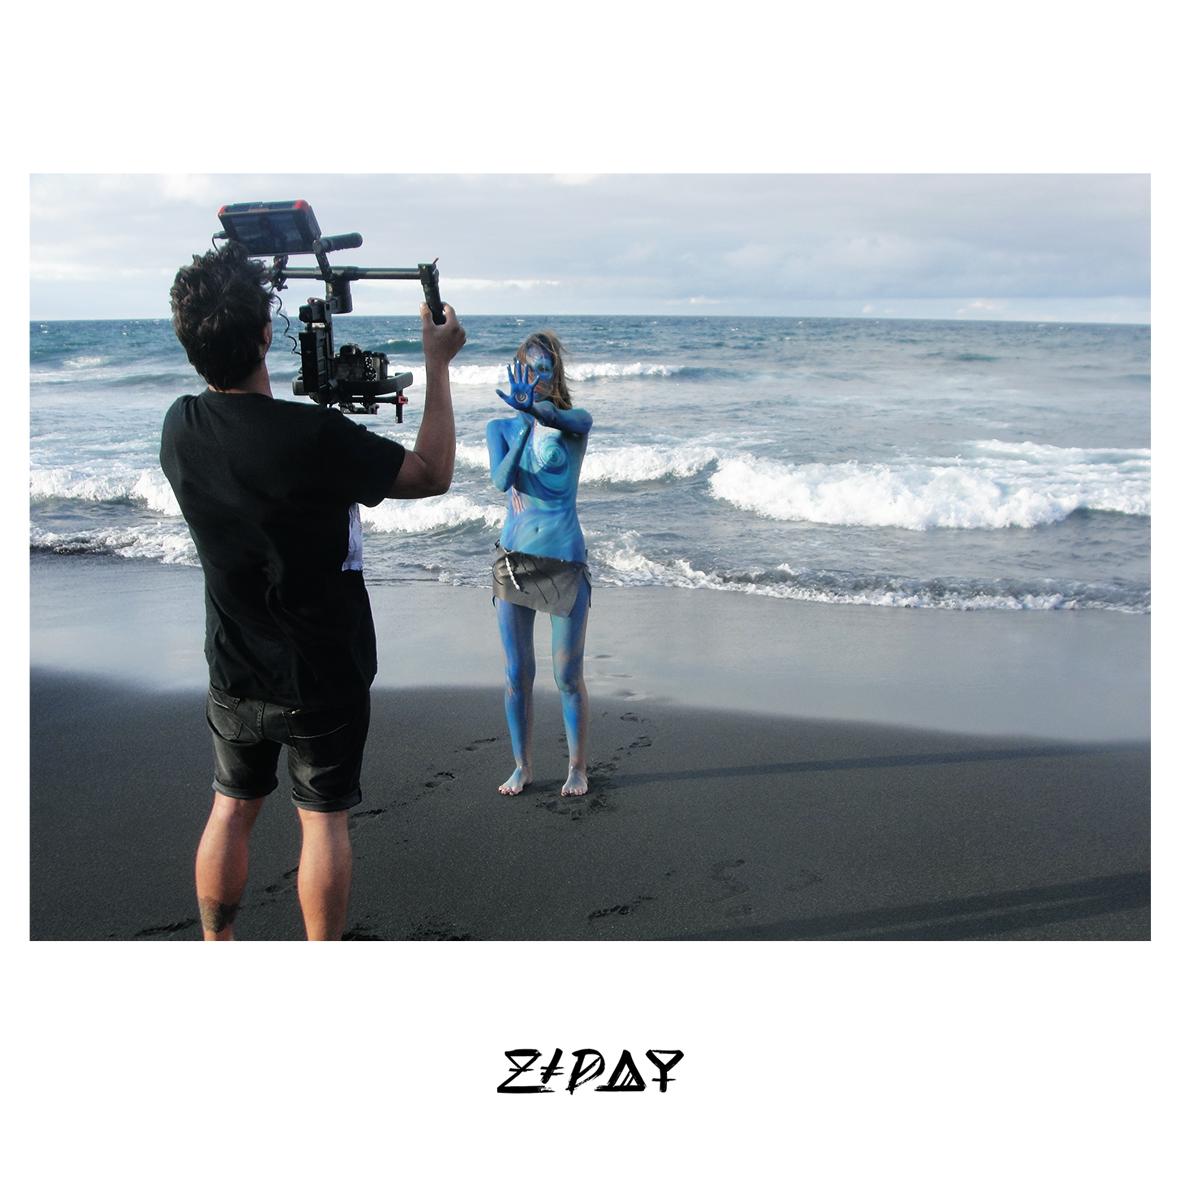 ziday-surgere-magazine